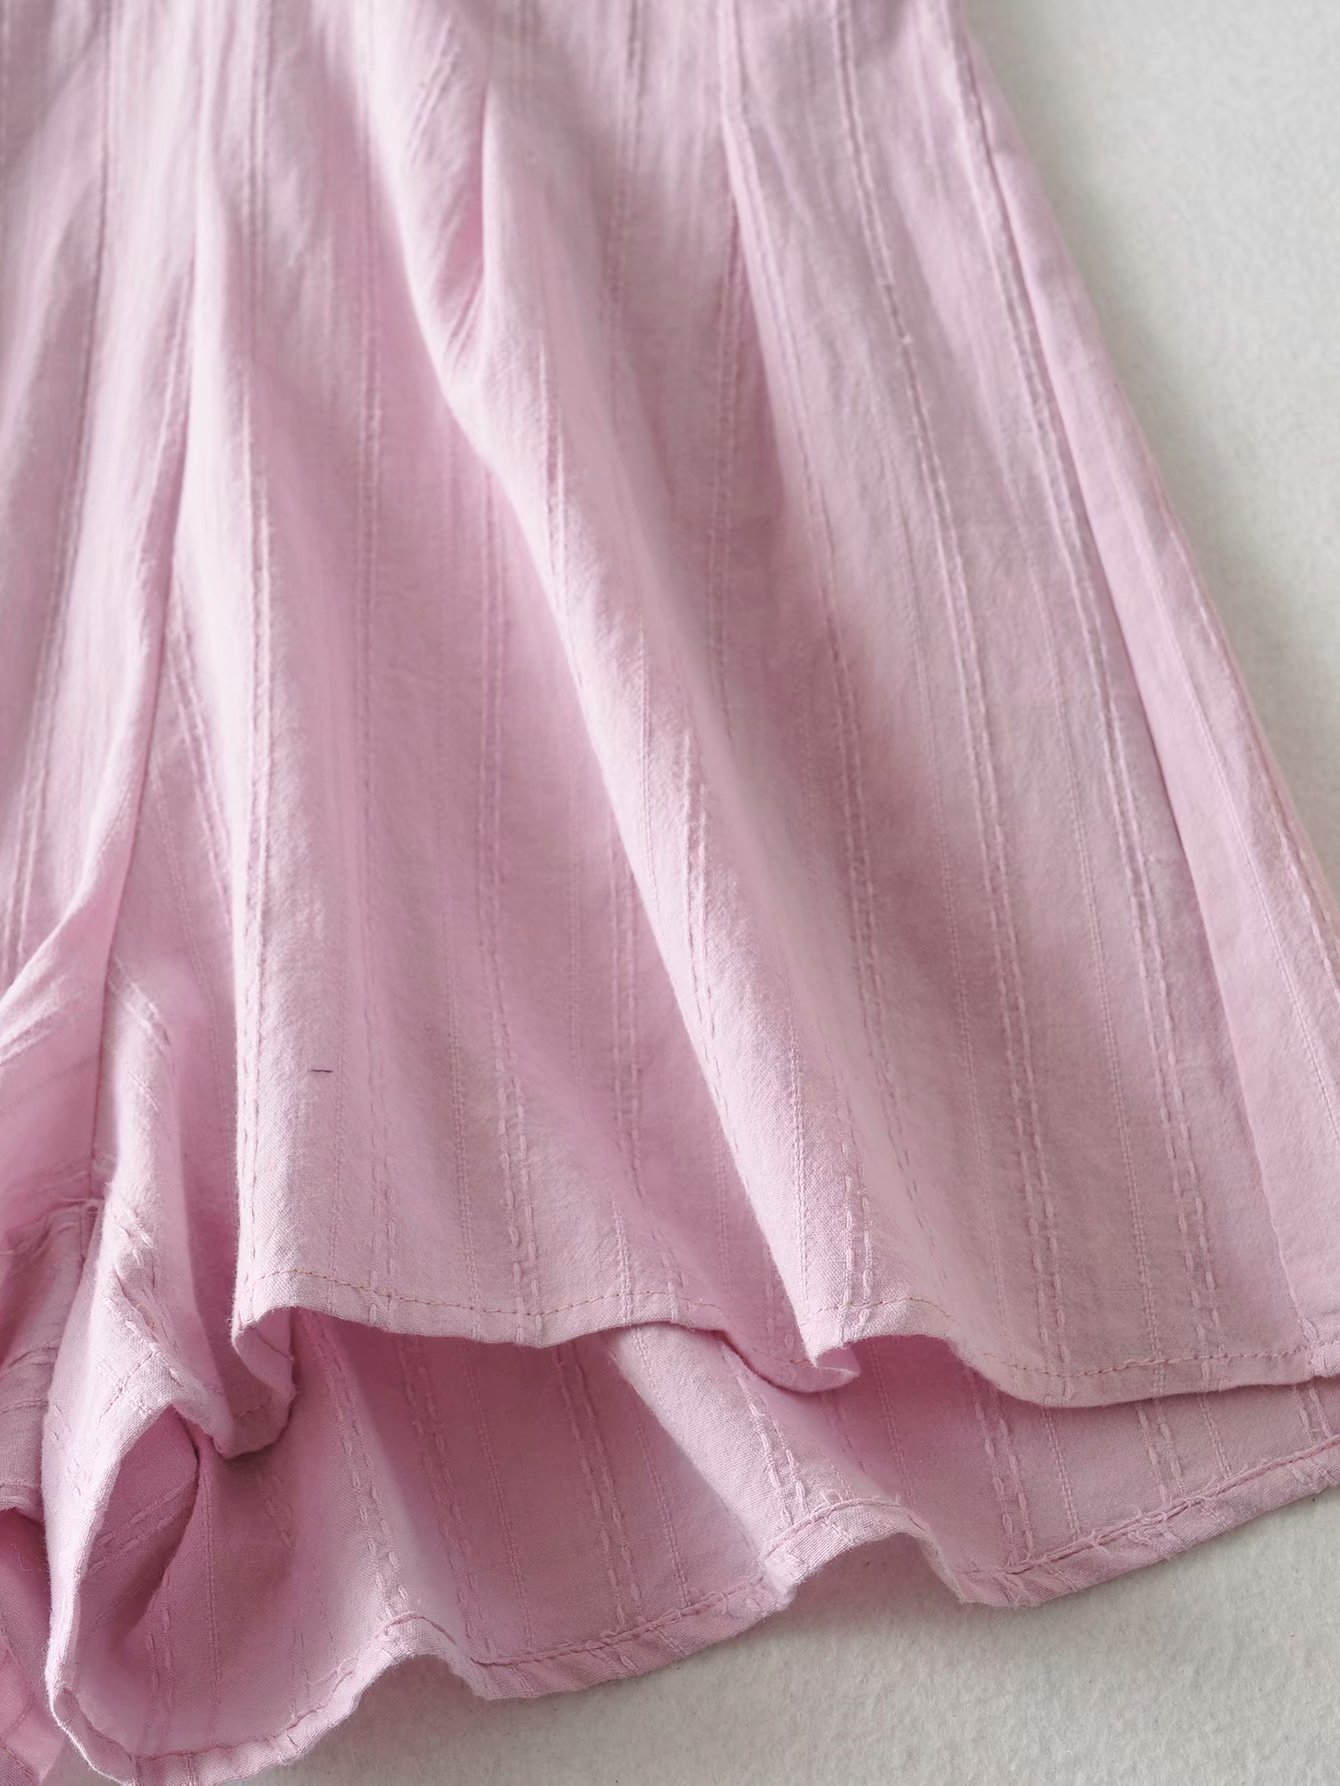 spring and summer new women's high waist short sleeve V-neck jacquard piece wide leg shorts wholesale nihaojewelry NHAM219679